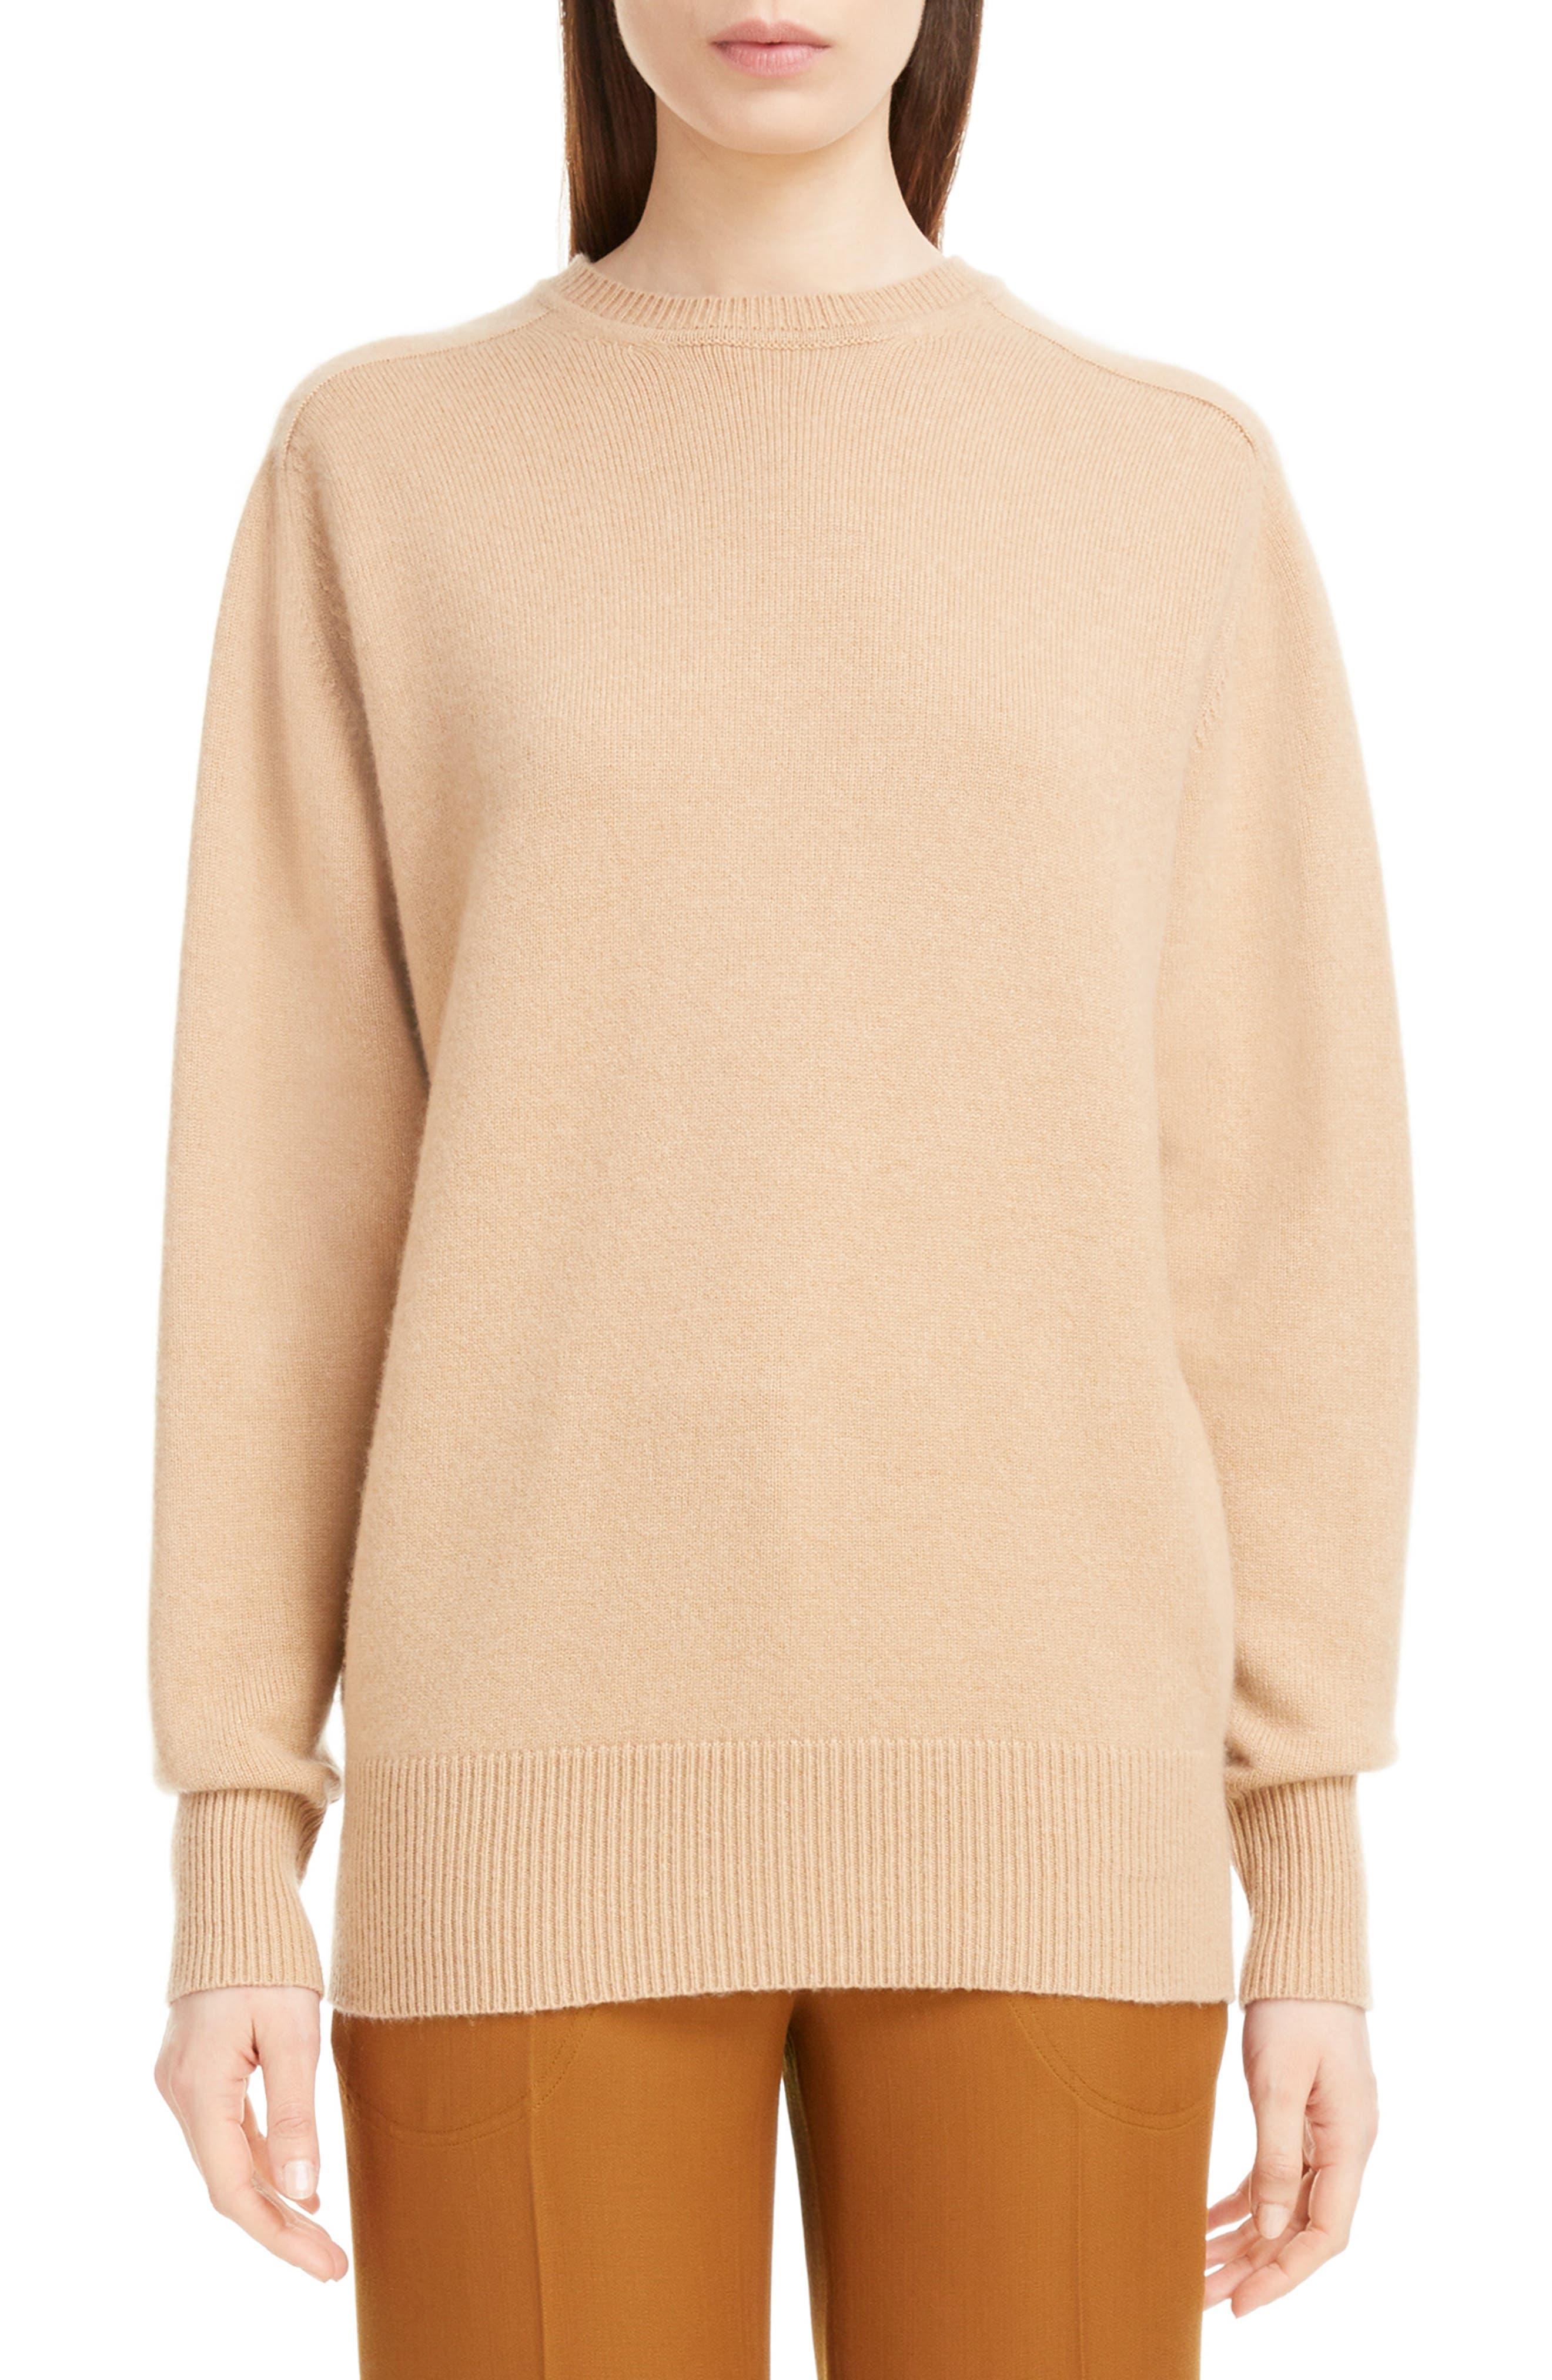 VICTORIA BECKHAM Cashmere Blend Sweater, Main, color, LIGHT CAMEL